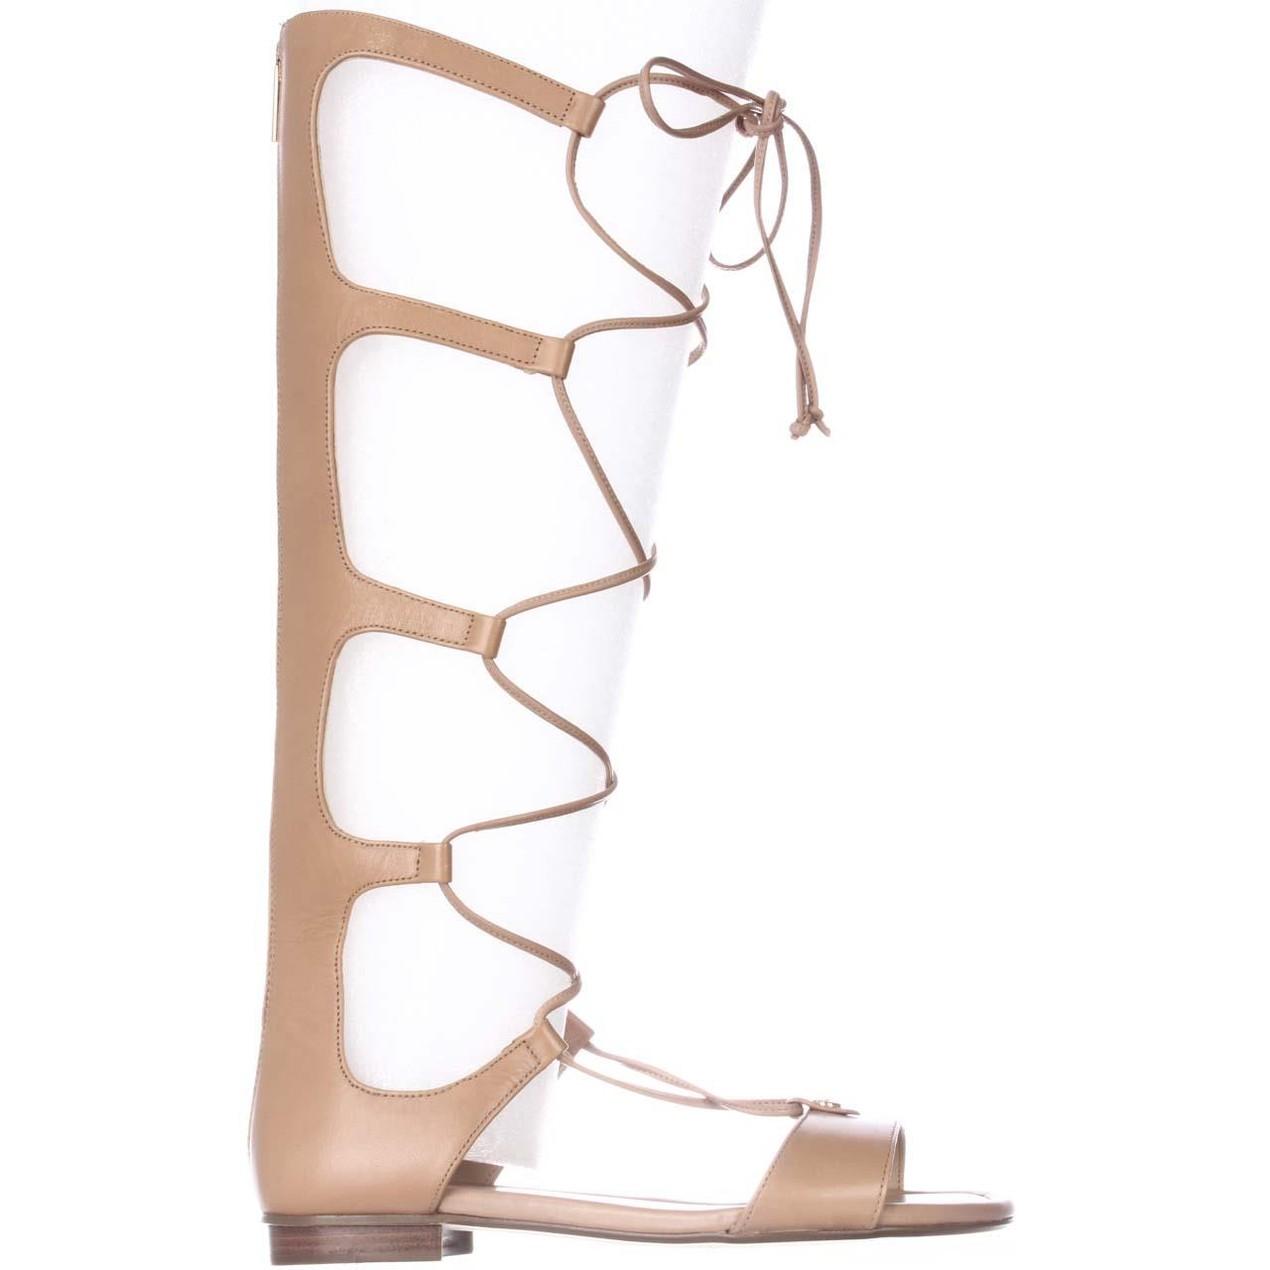 feb50a3814da MICHAEL Michael Kors Sofia Knee-High Gladiator Sandals - Suntan - Tanga